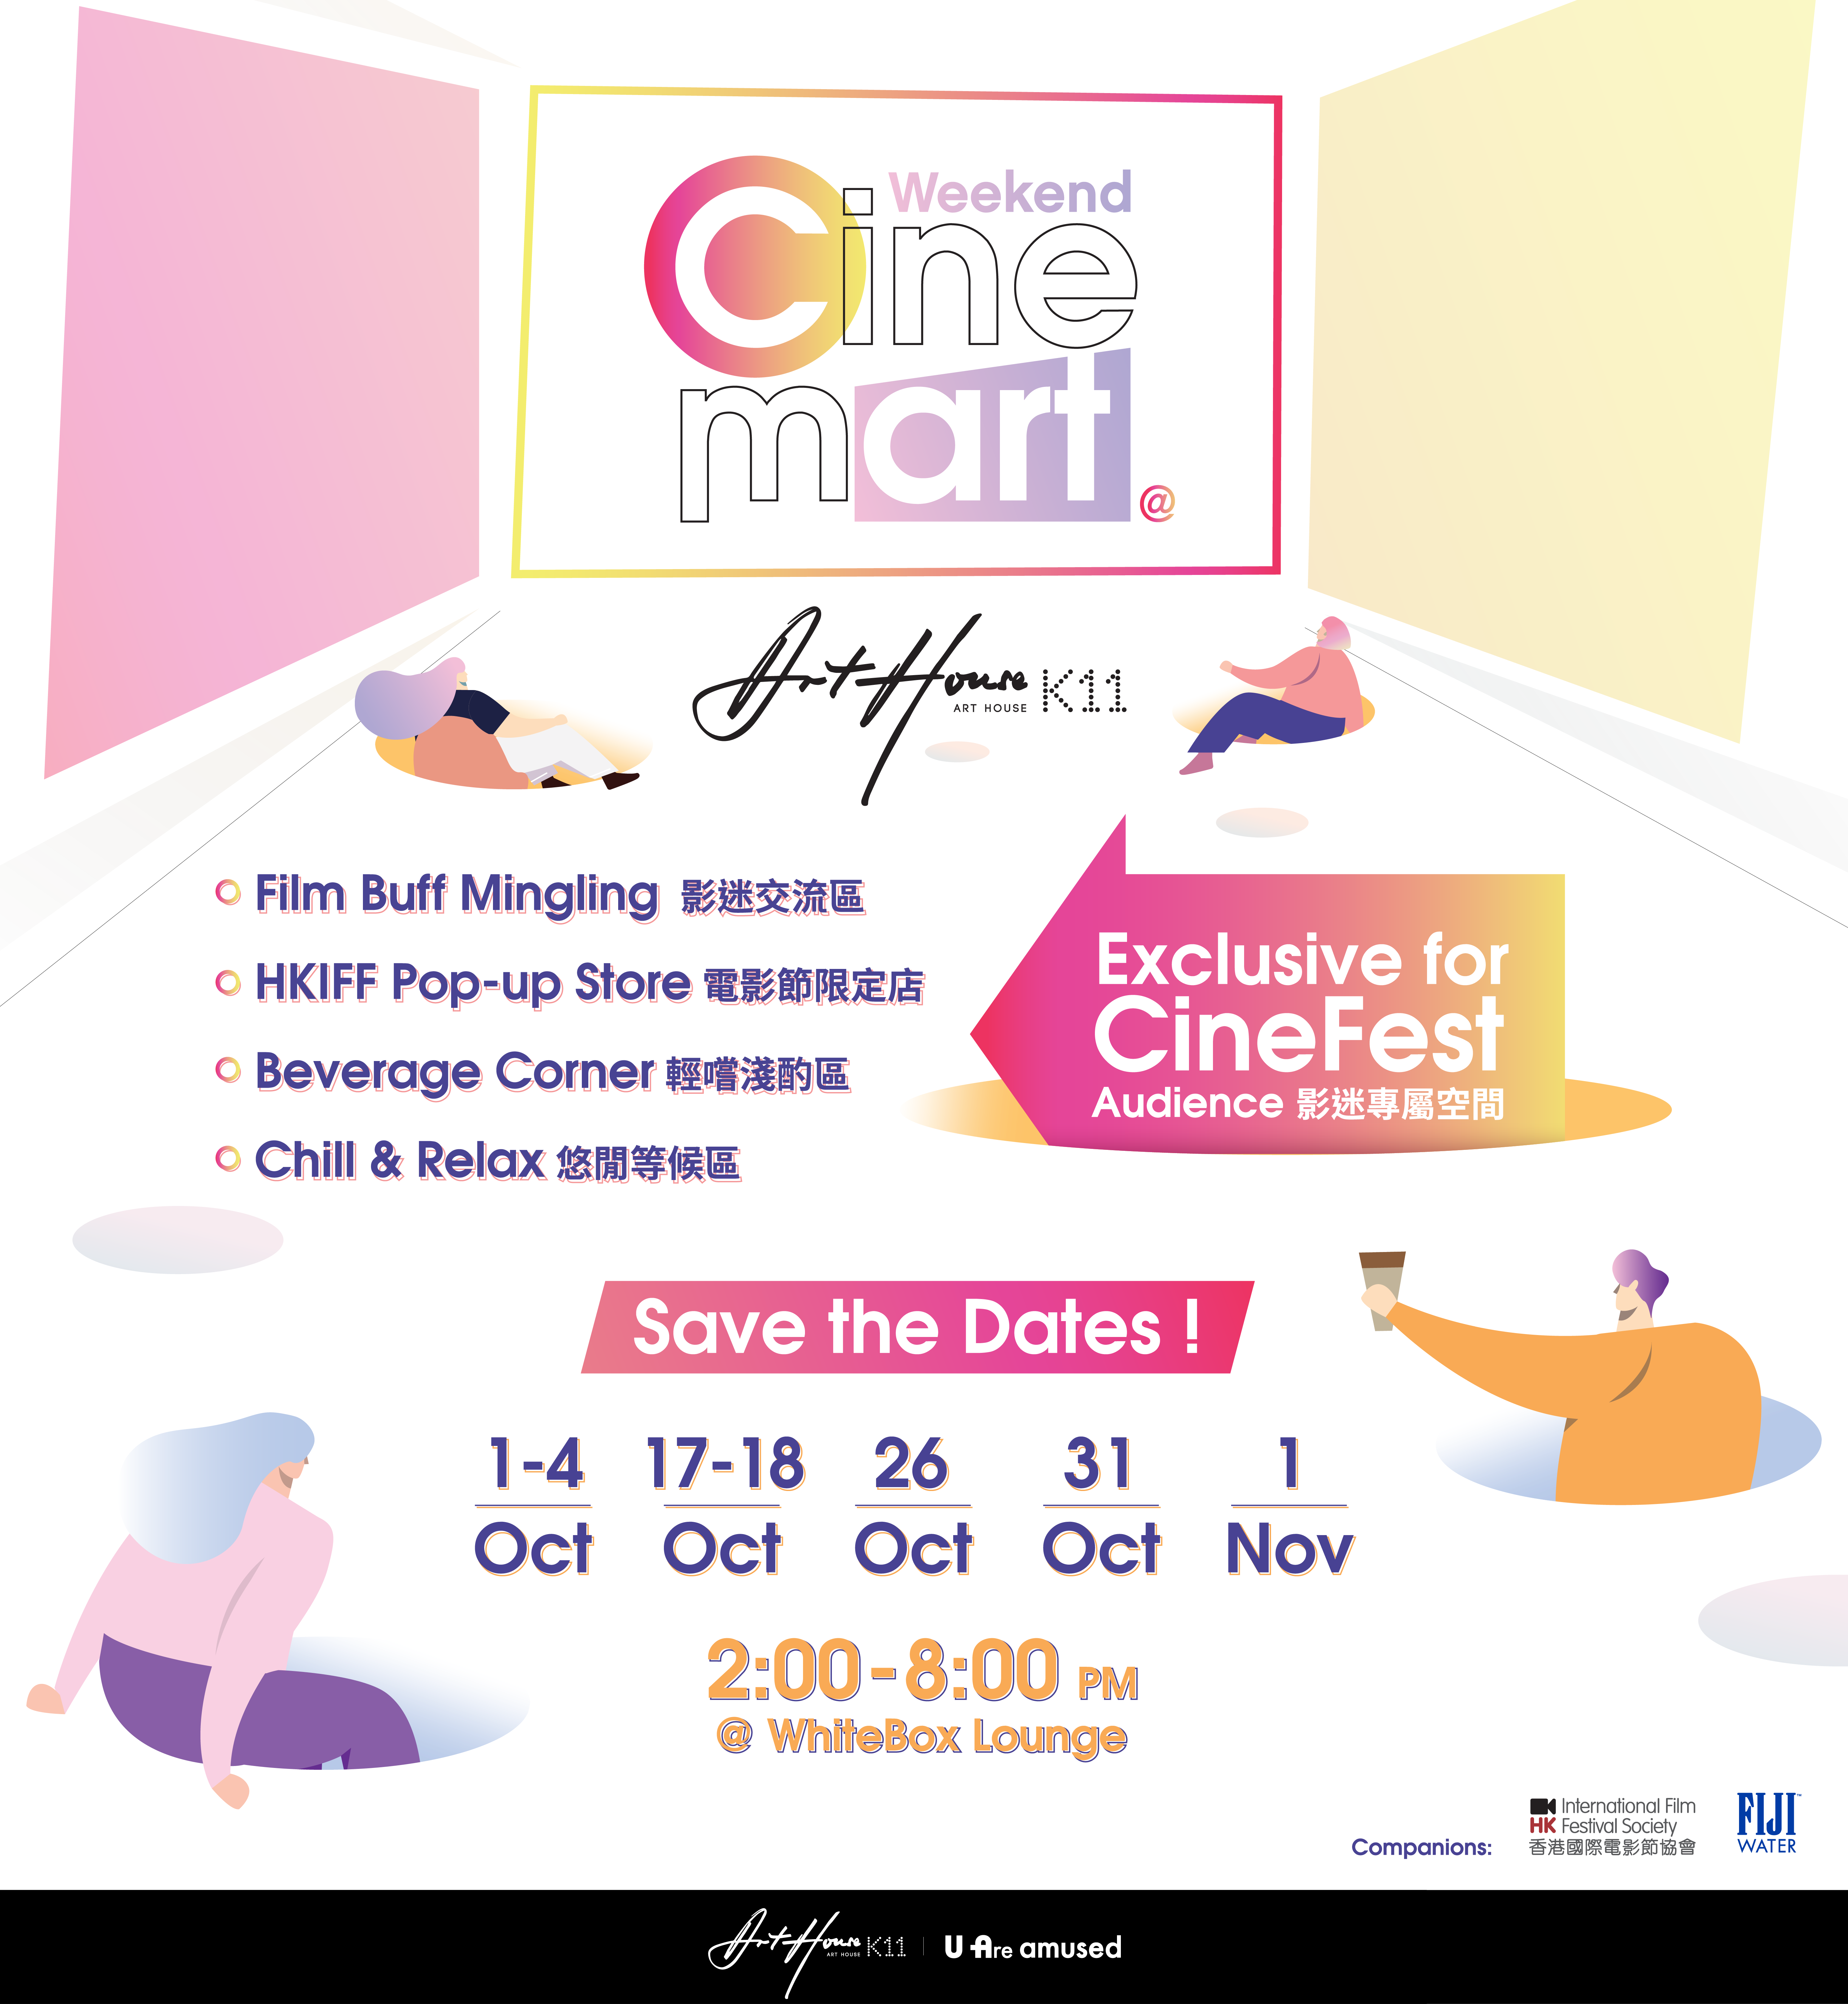 【📽 Weekend Cine Mart @ K11 Art House 💡】- Exclusive for CineFest Audience